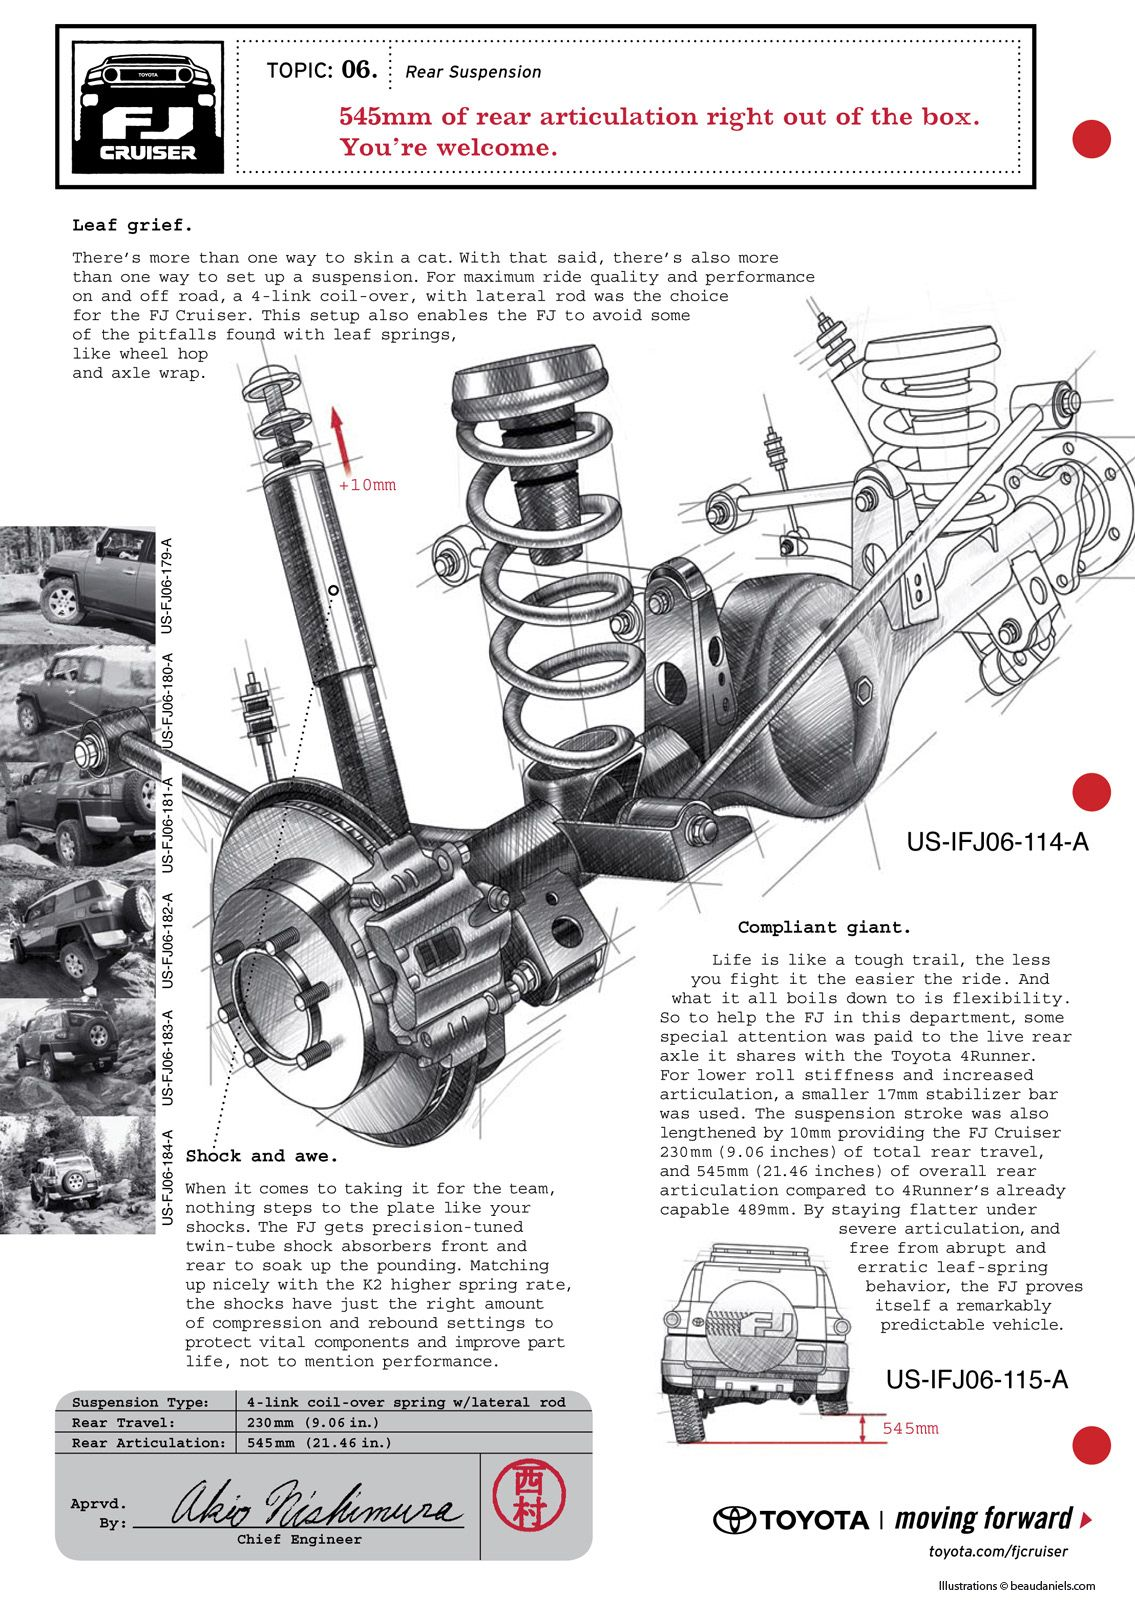 small resolution of fj cruiser ads rear suspension technical illustration toyota fjfj cruiser ads rear suspension technical illustration